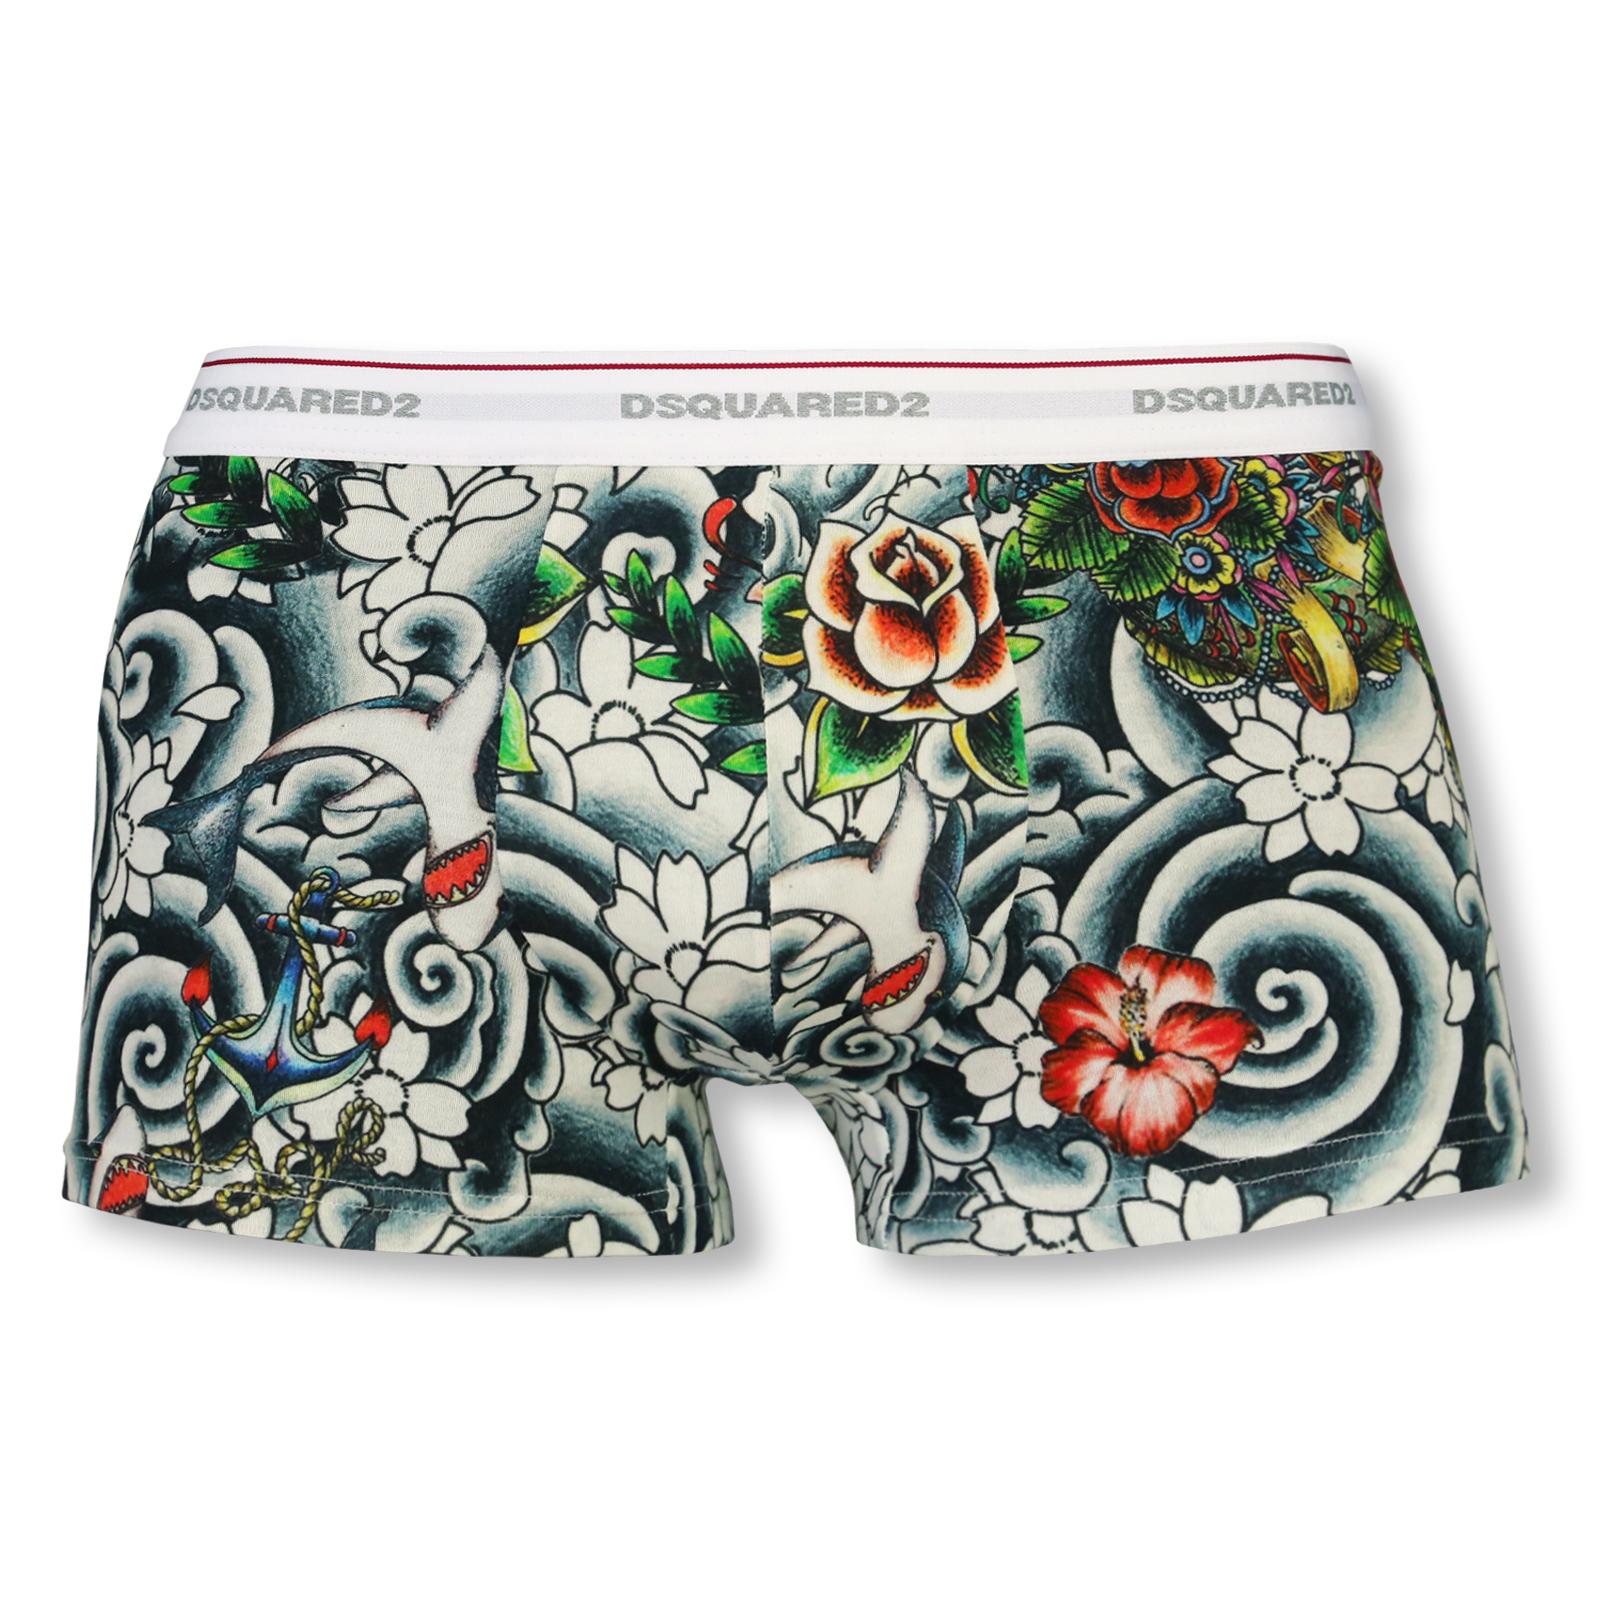 Dsquared2 Shorts Pants Trunks Unterhose M L XL D9LC71400 in print